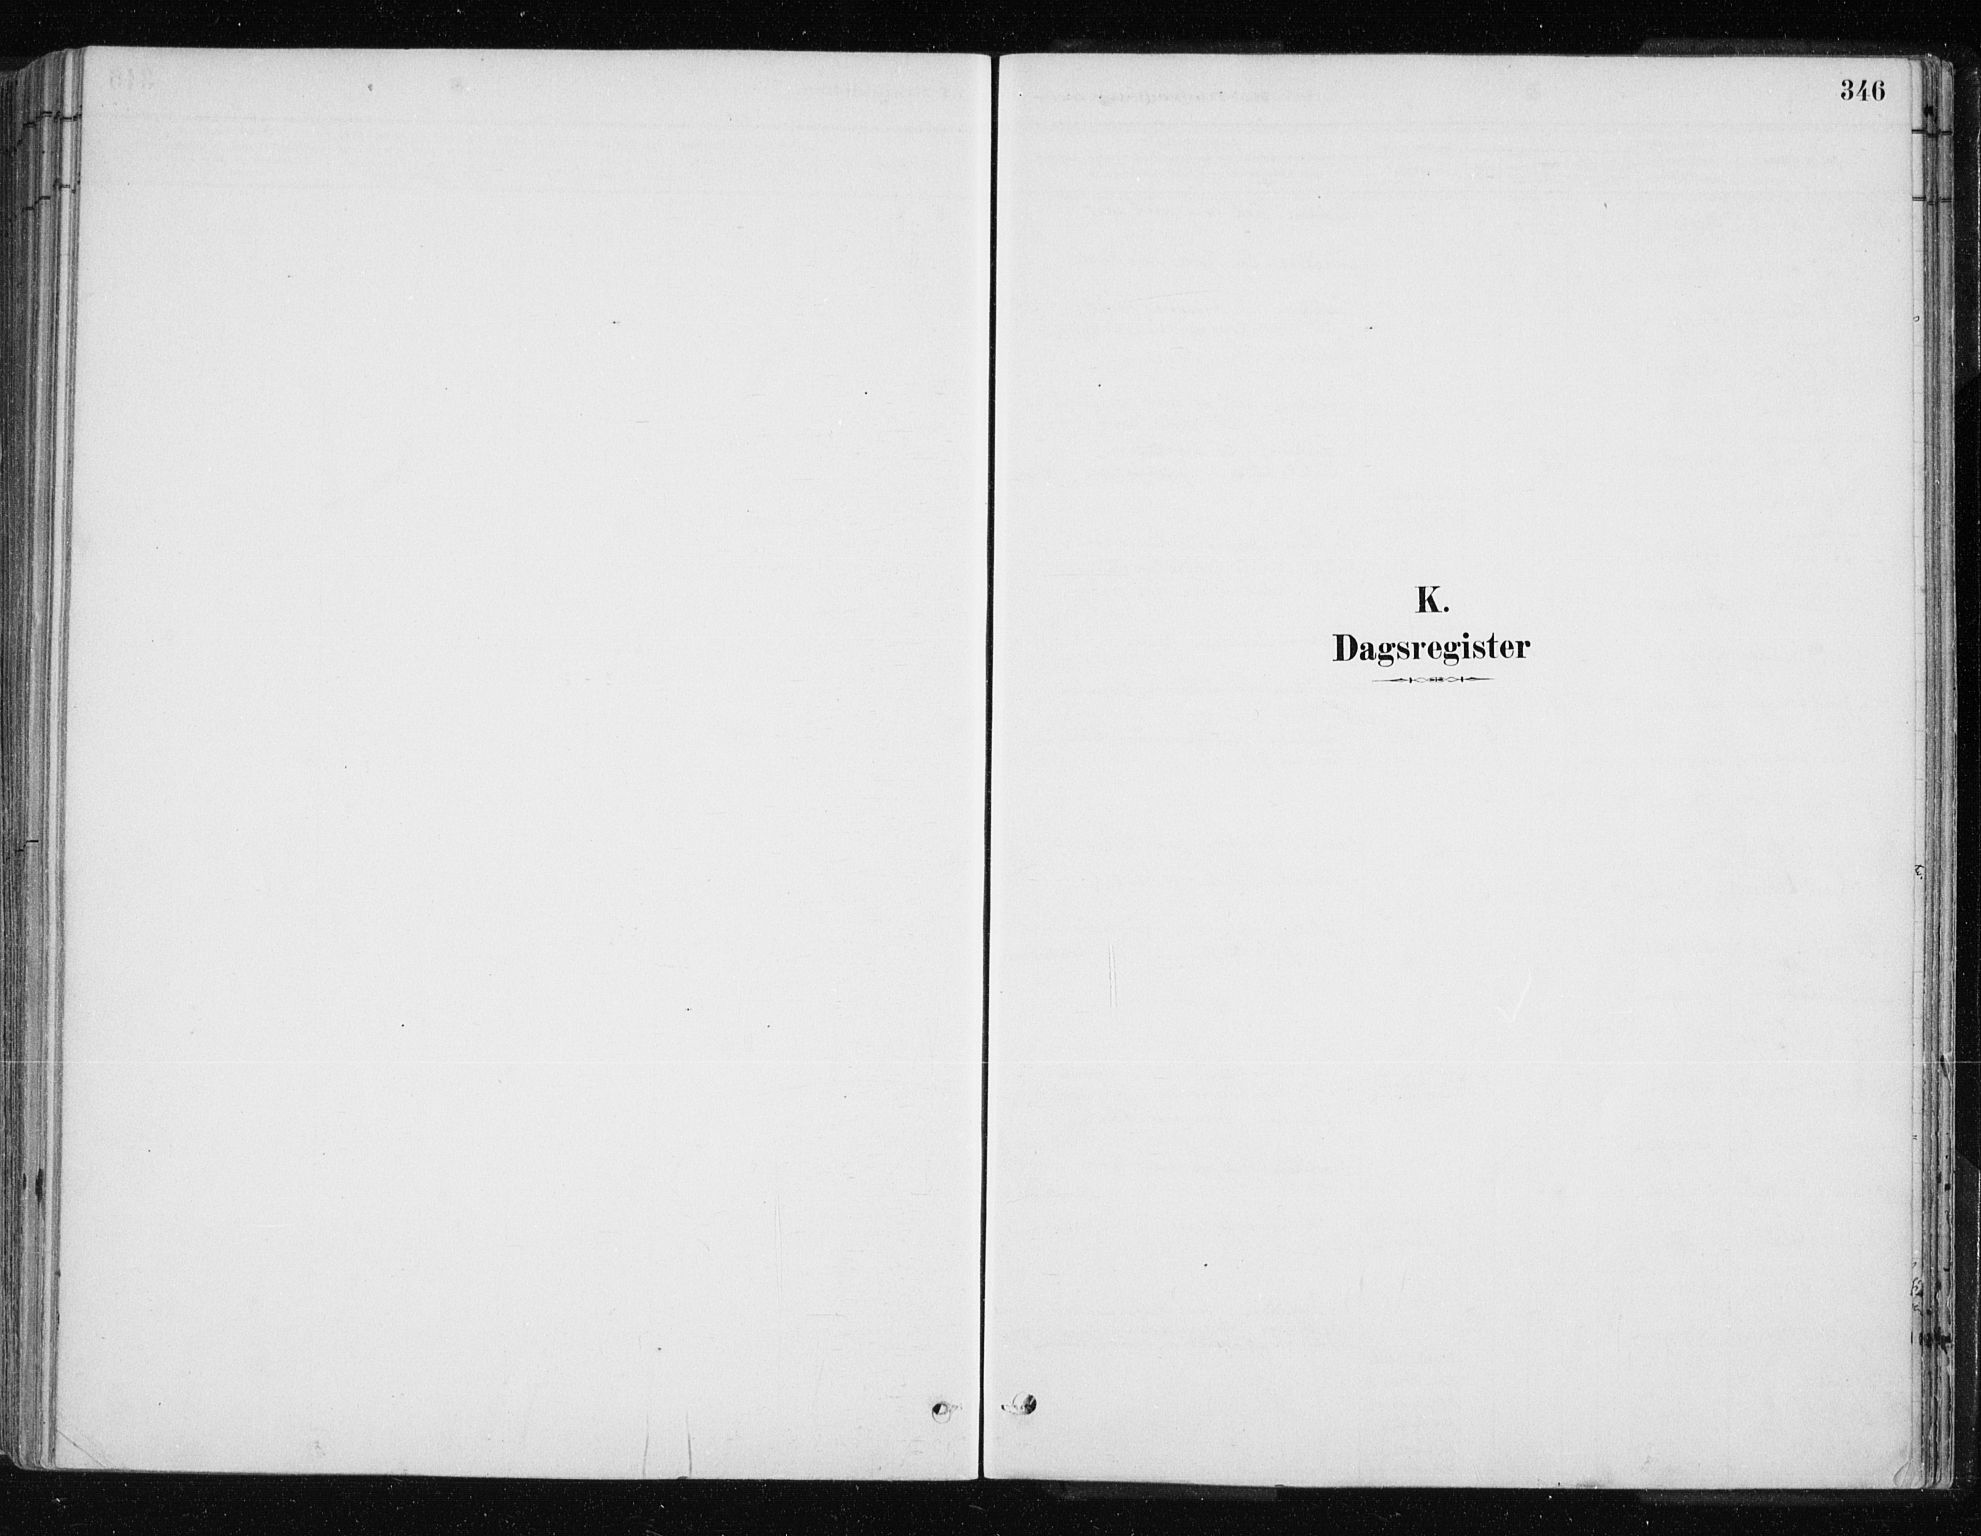 SATØ, Lyngen sokneprestembete, H/He/Hea/L0007kirke: Ministerialbok nr. 7, 1879-1890, s. 346